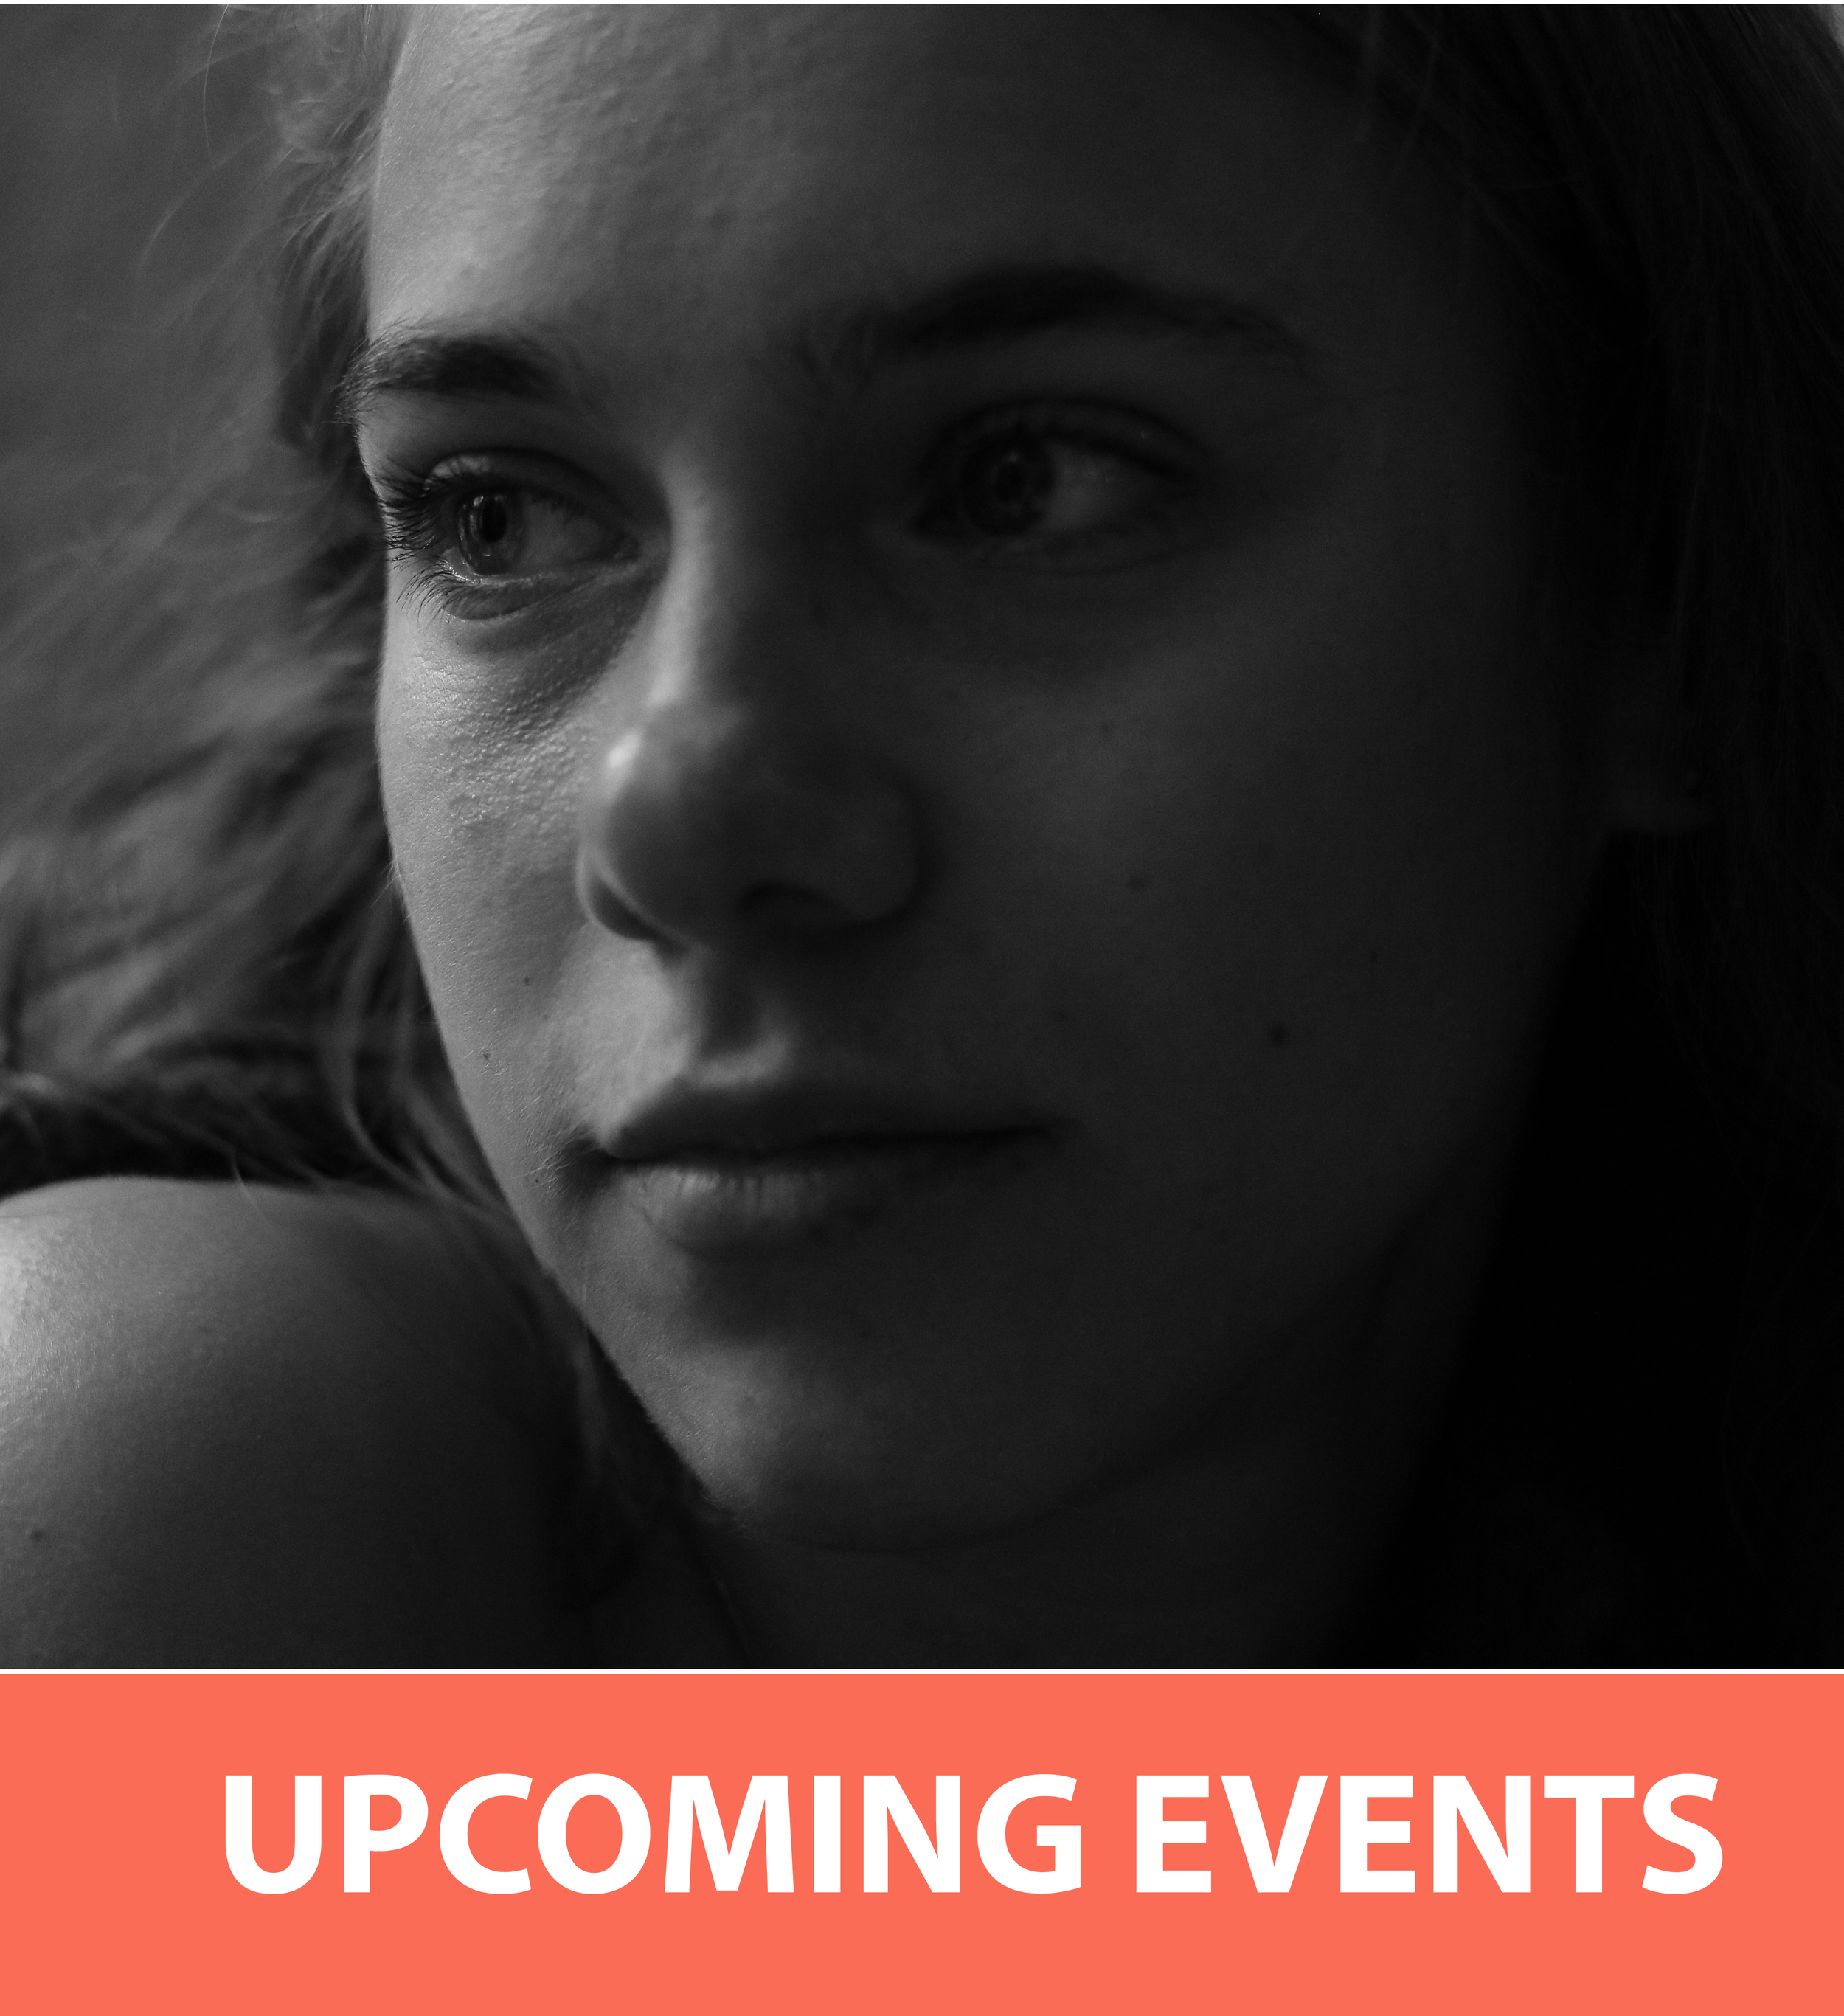 SENBAN_UPCOMING EVENTS .png